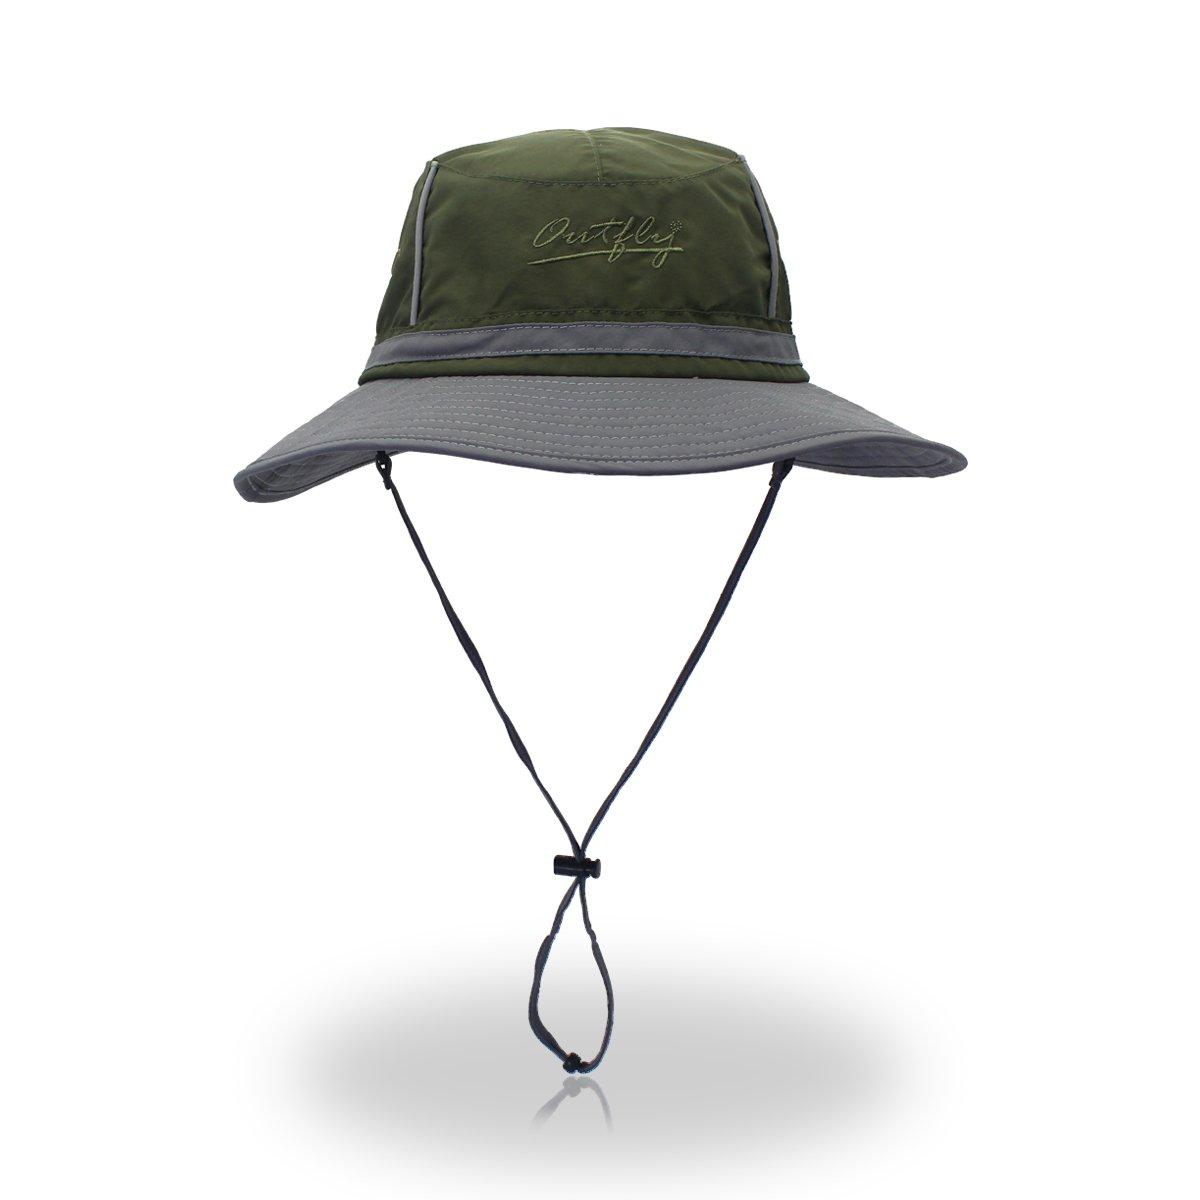 5fbb751d Amazon.com : FayTop Summer Sun Hat UPF 50+ Boonie Hat Adjustable Bucket  Hats Sun Protection Hat Outdoor Cap Hat Fishing Hat for Women Men  B16015-Army ...